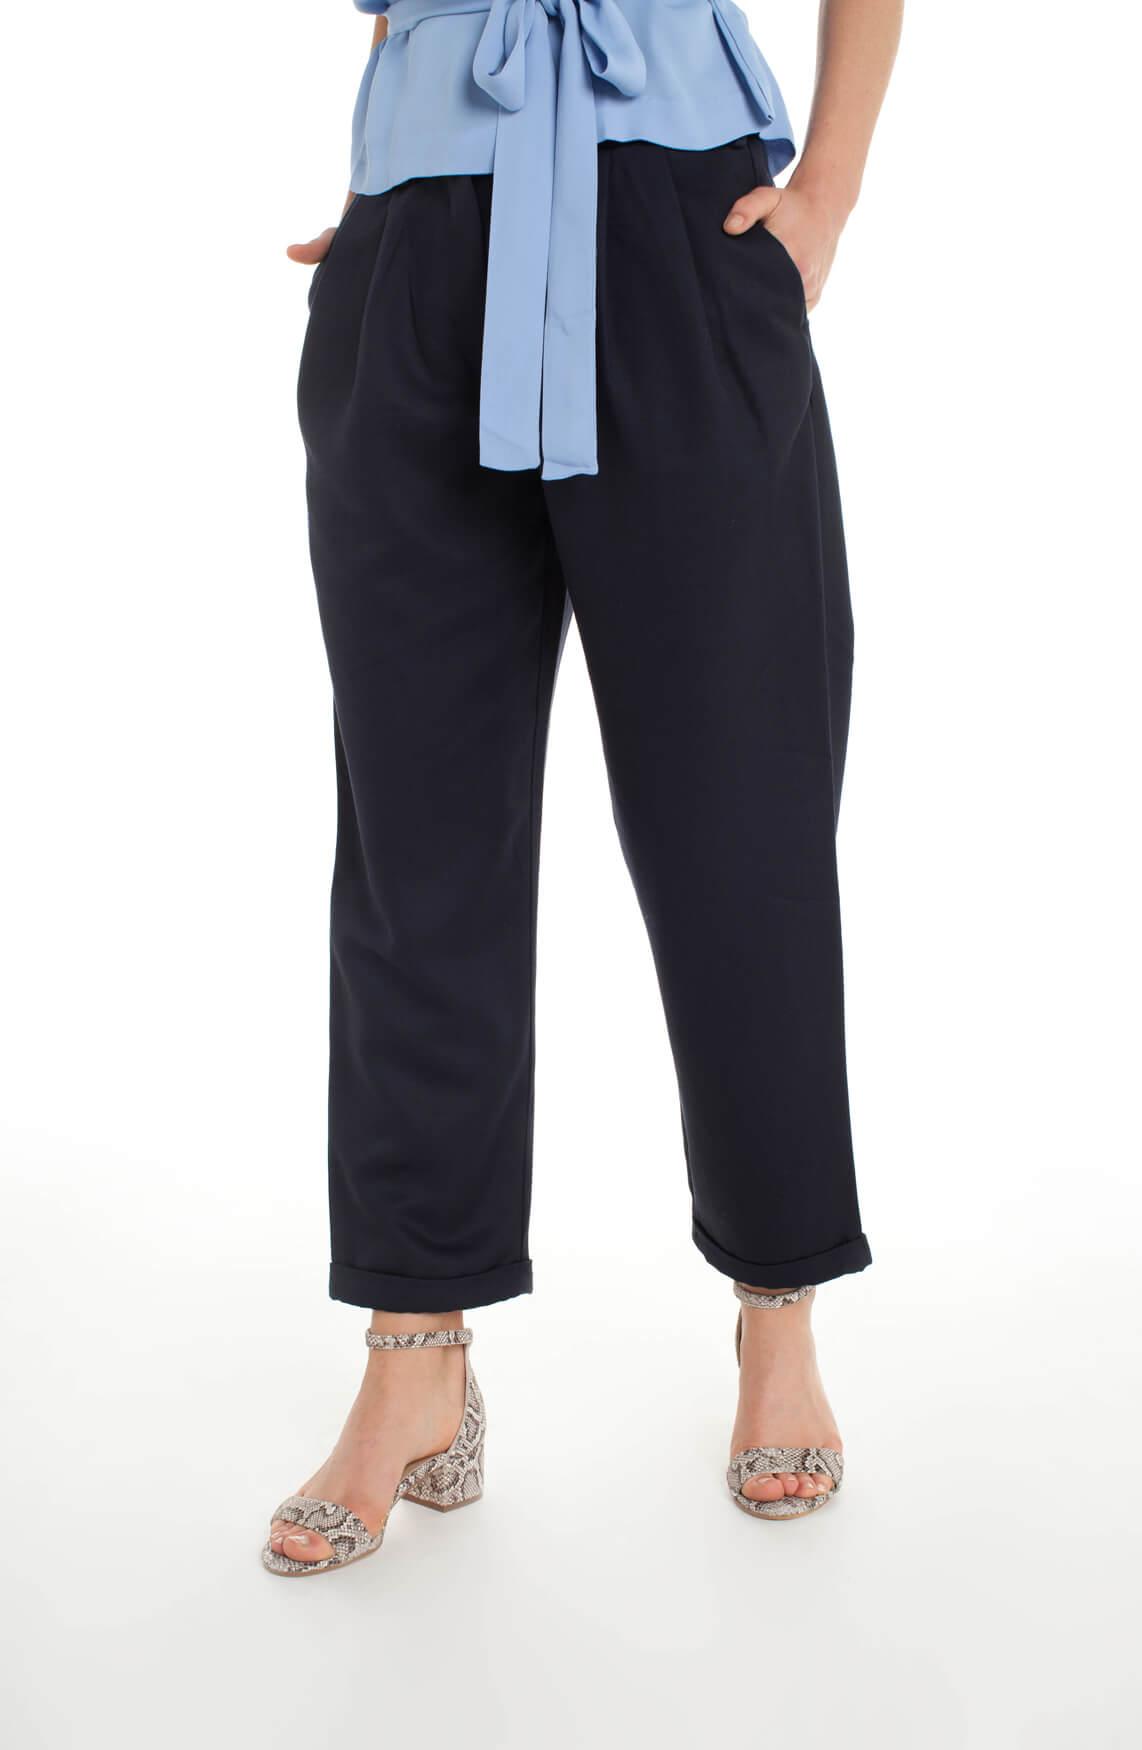 Samsoe Samsoe Dames Delaun pantalon Blauw